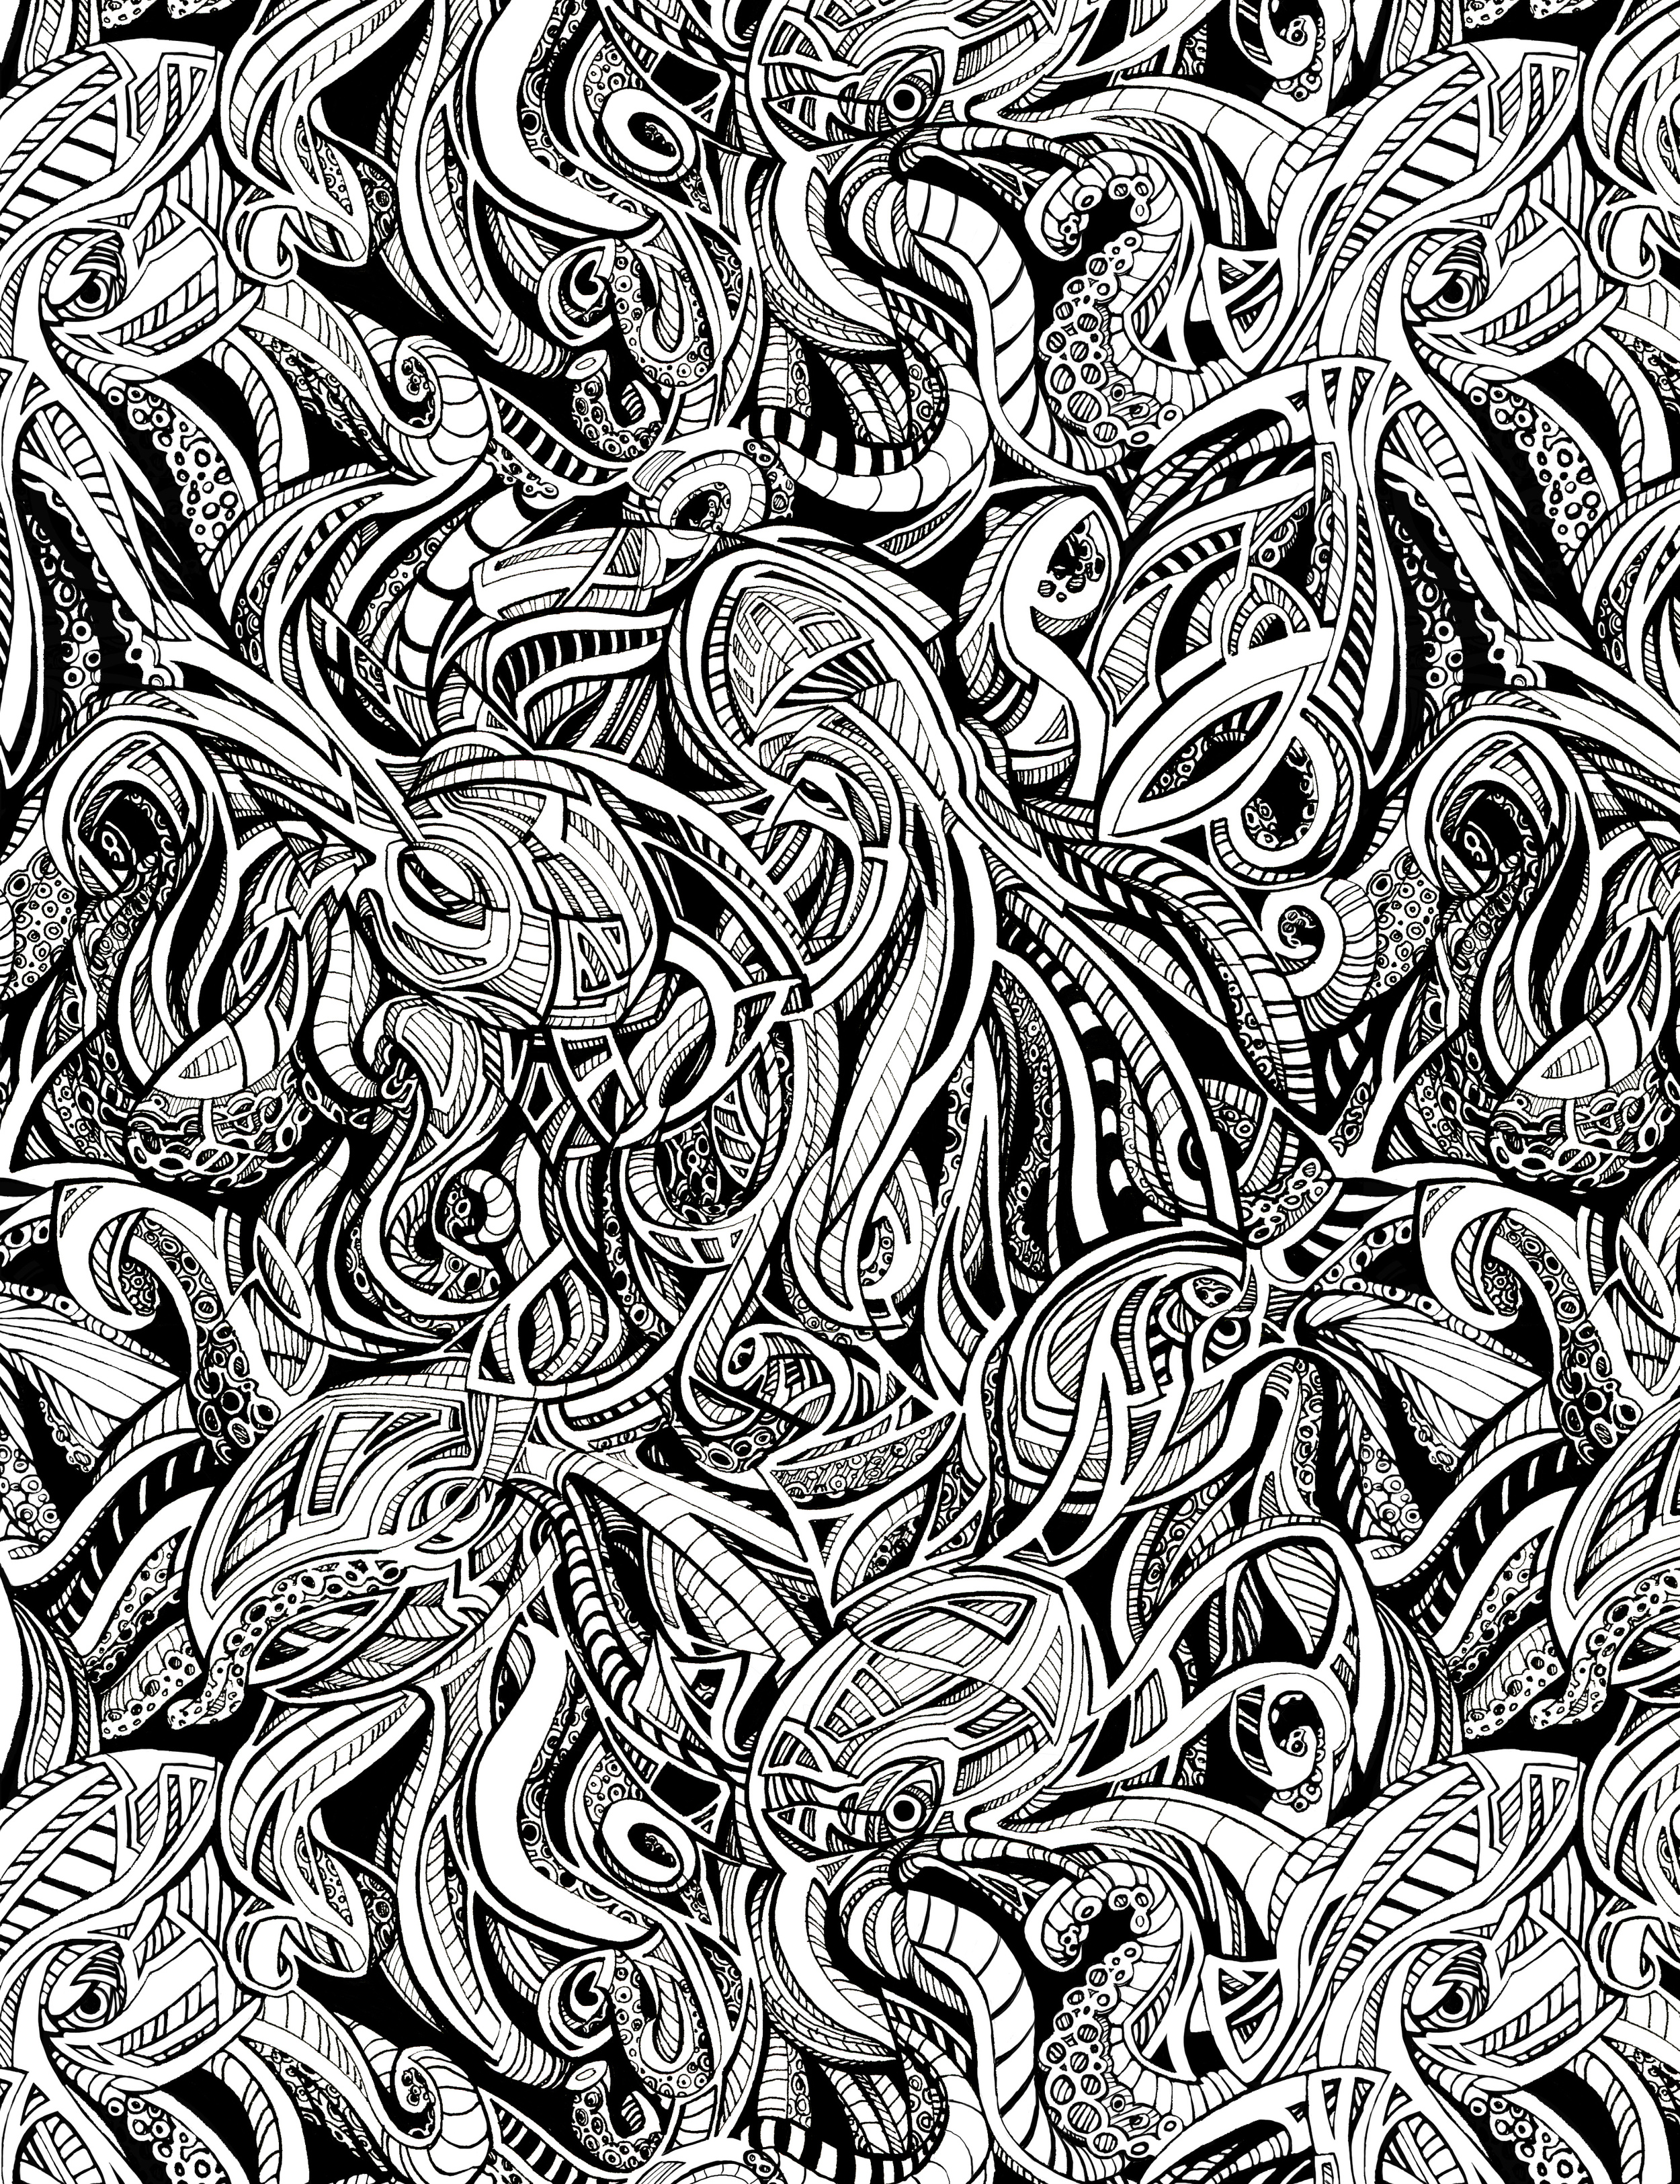 octopus_bw_uncommon.jpg